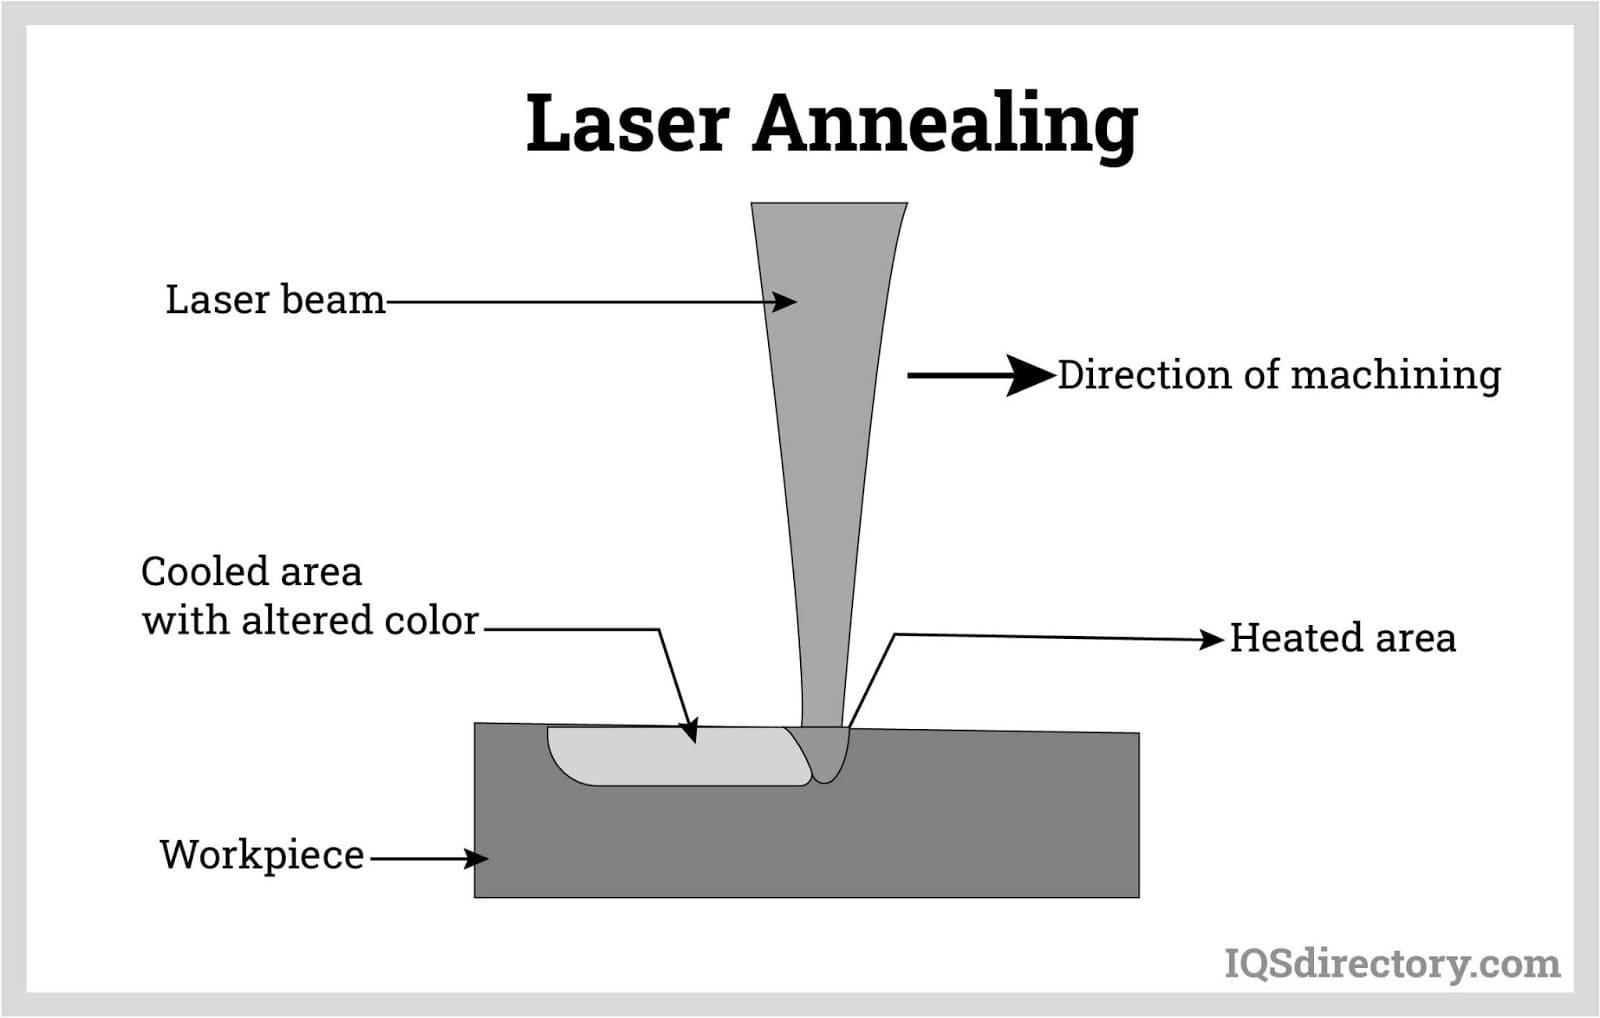 Laser Annealing